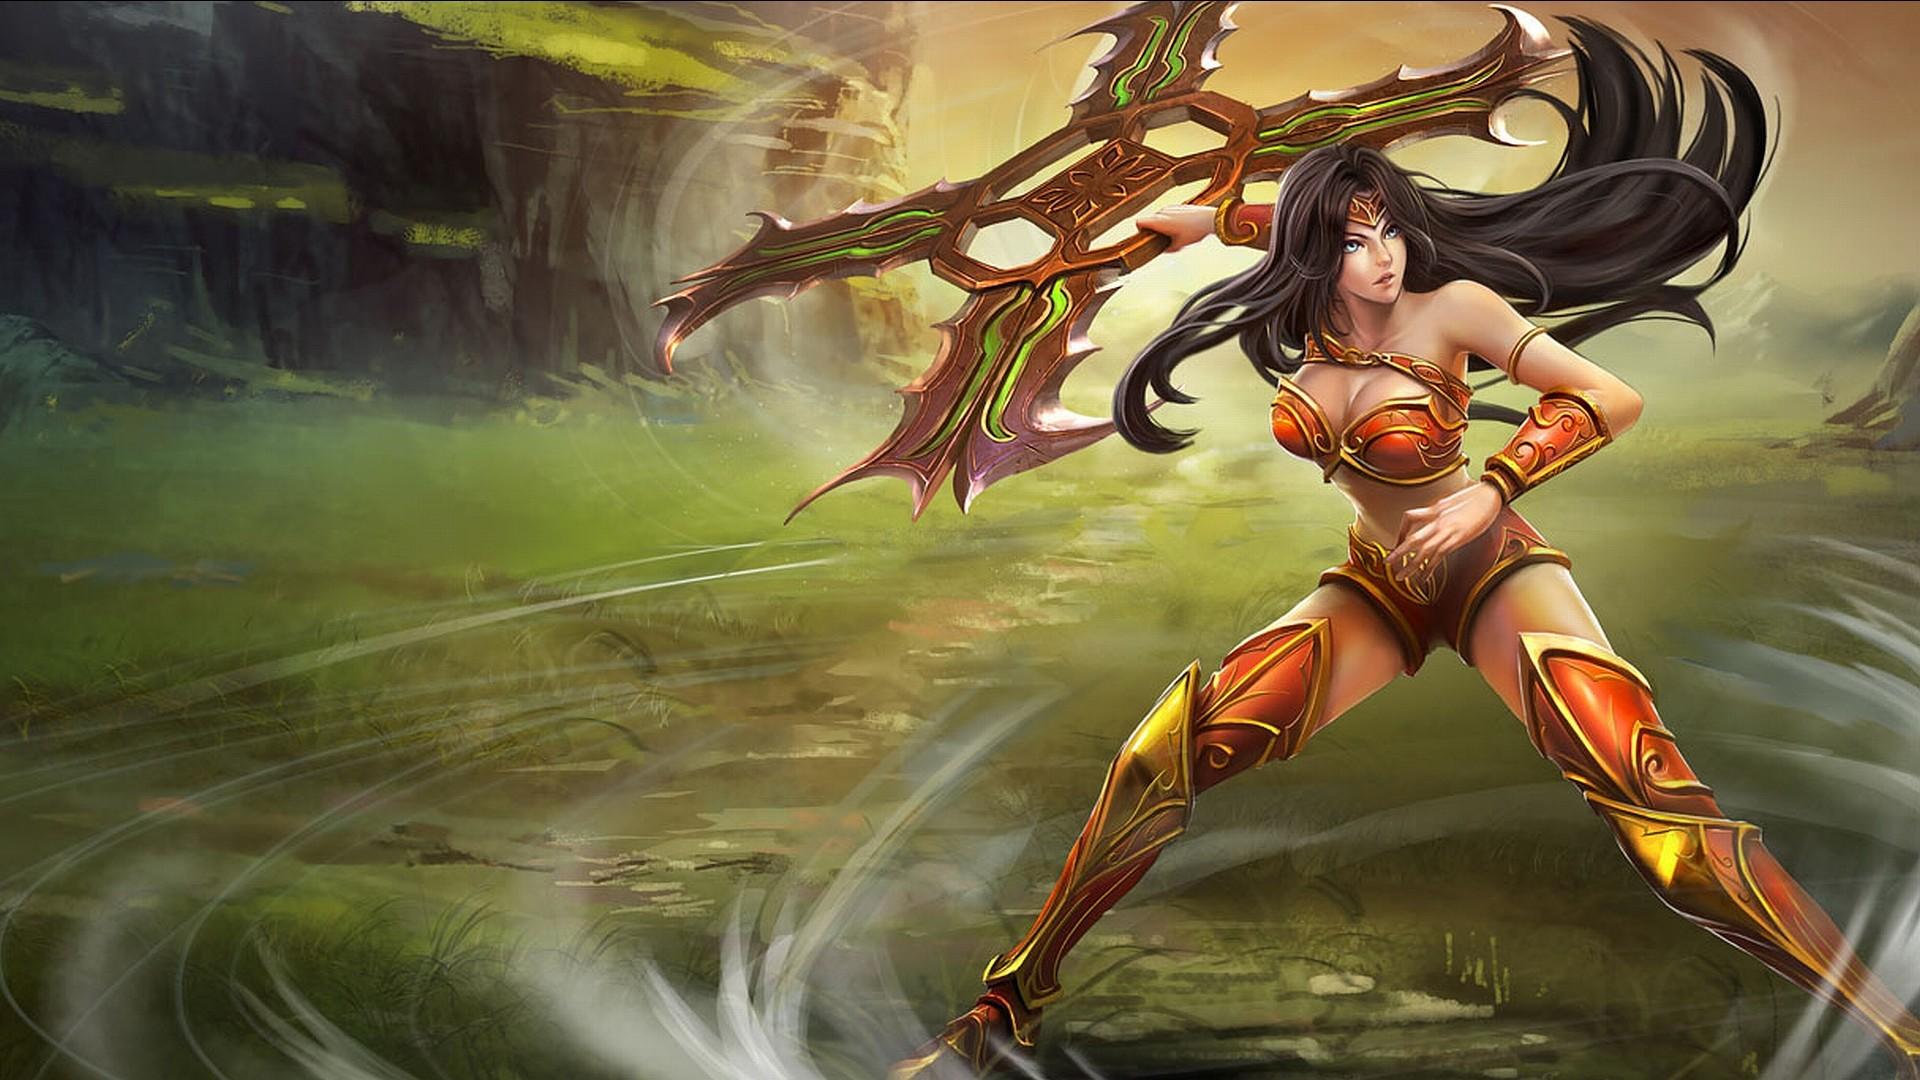 Download Free fantasy Wallpapers   women warrior Wallpaper Backgrounds    WallpaperBackgrounds.com